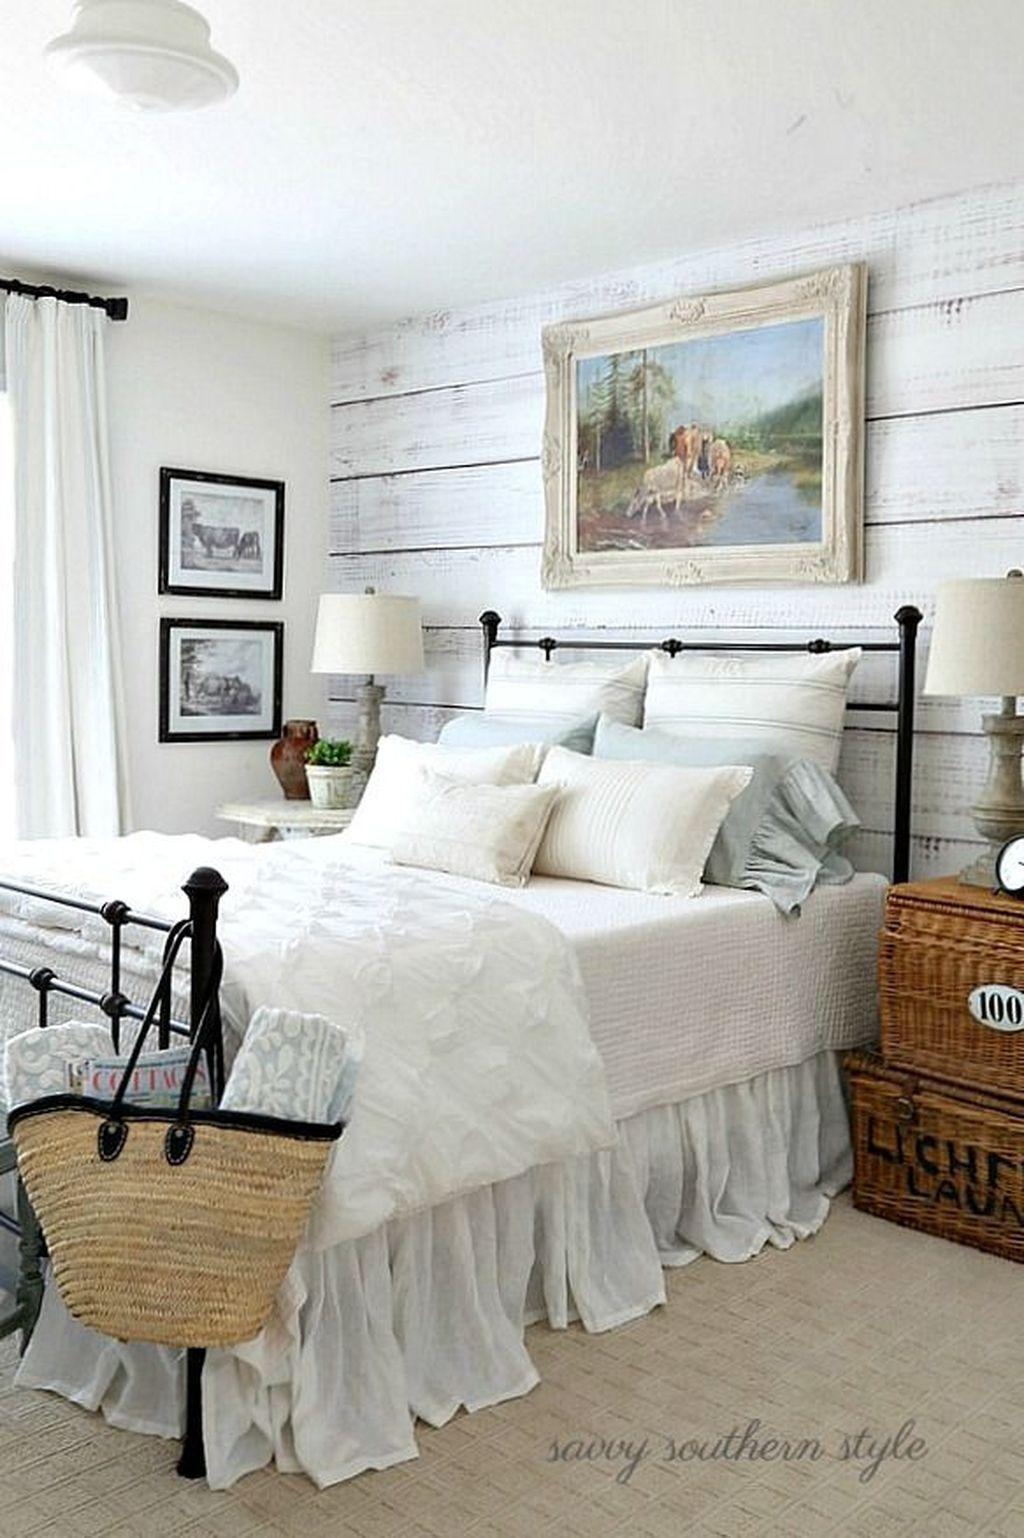 Rustic Decor Bedroom Farmhouse Style Ideas 65